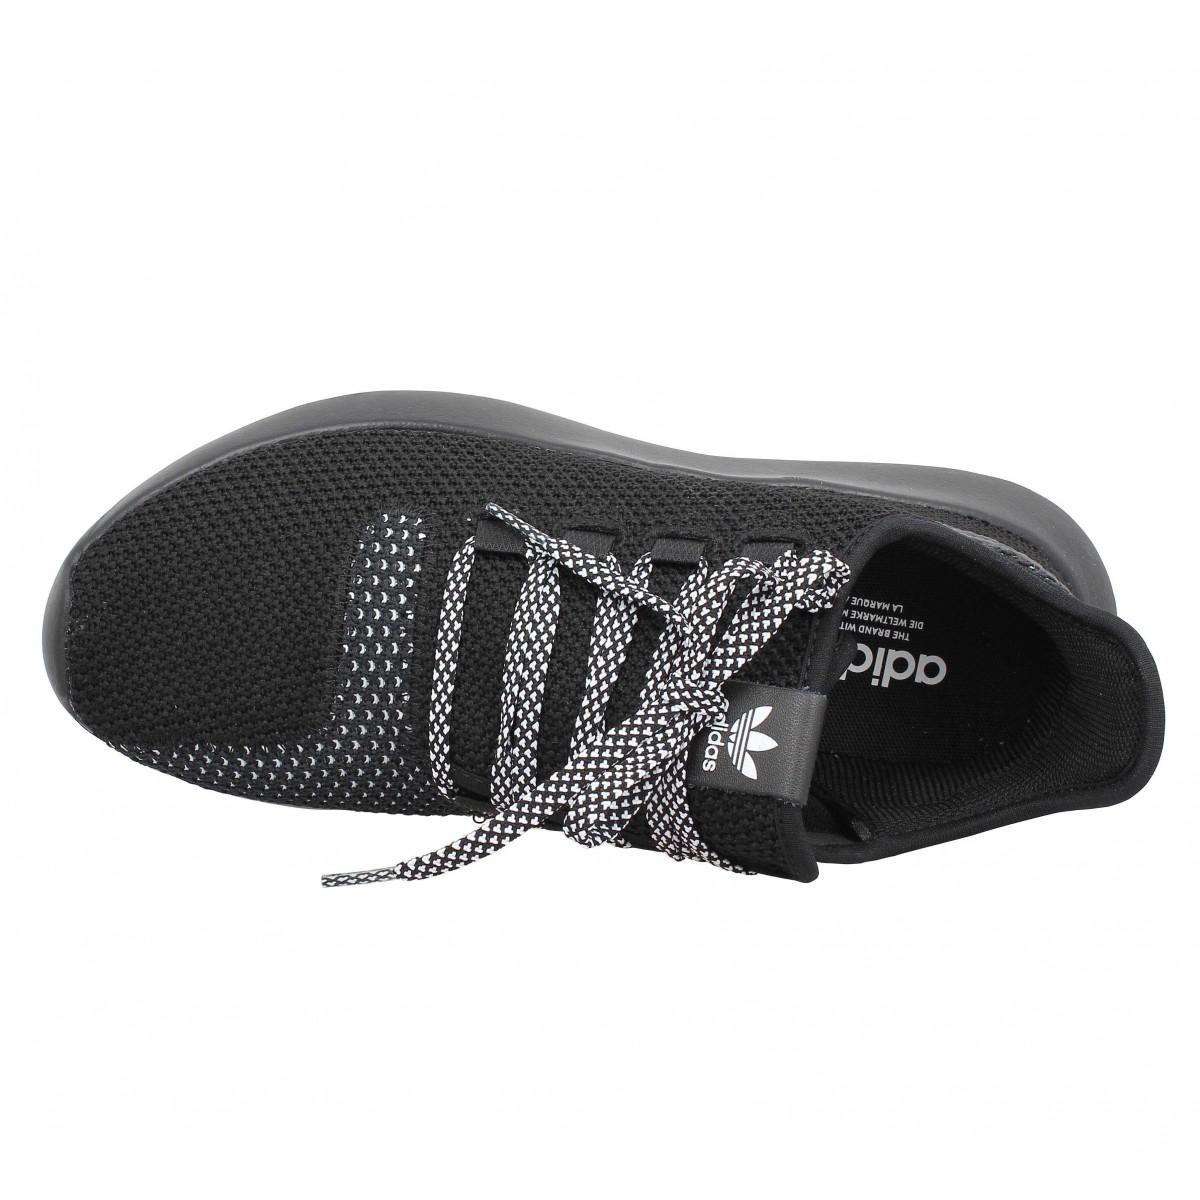 Adidas Tubular Shadow toile Homme 40 23 Blanc pas cher